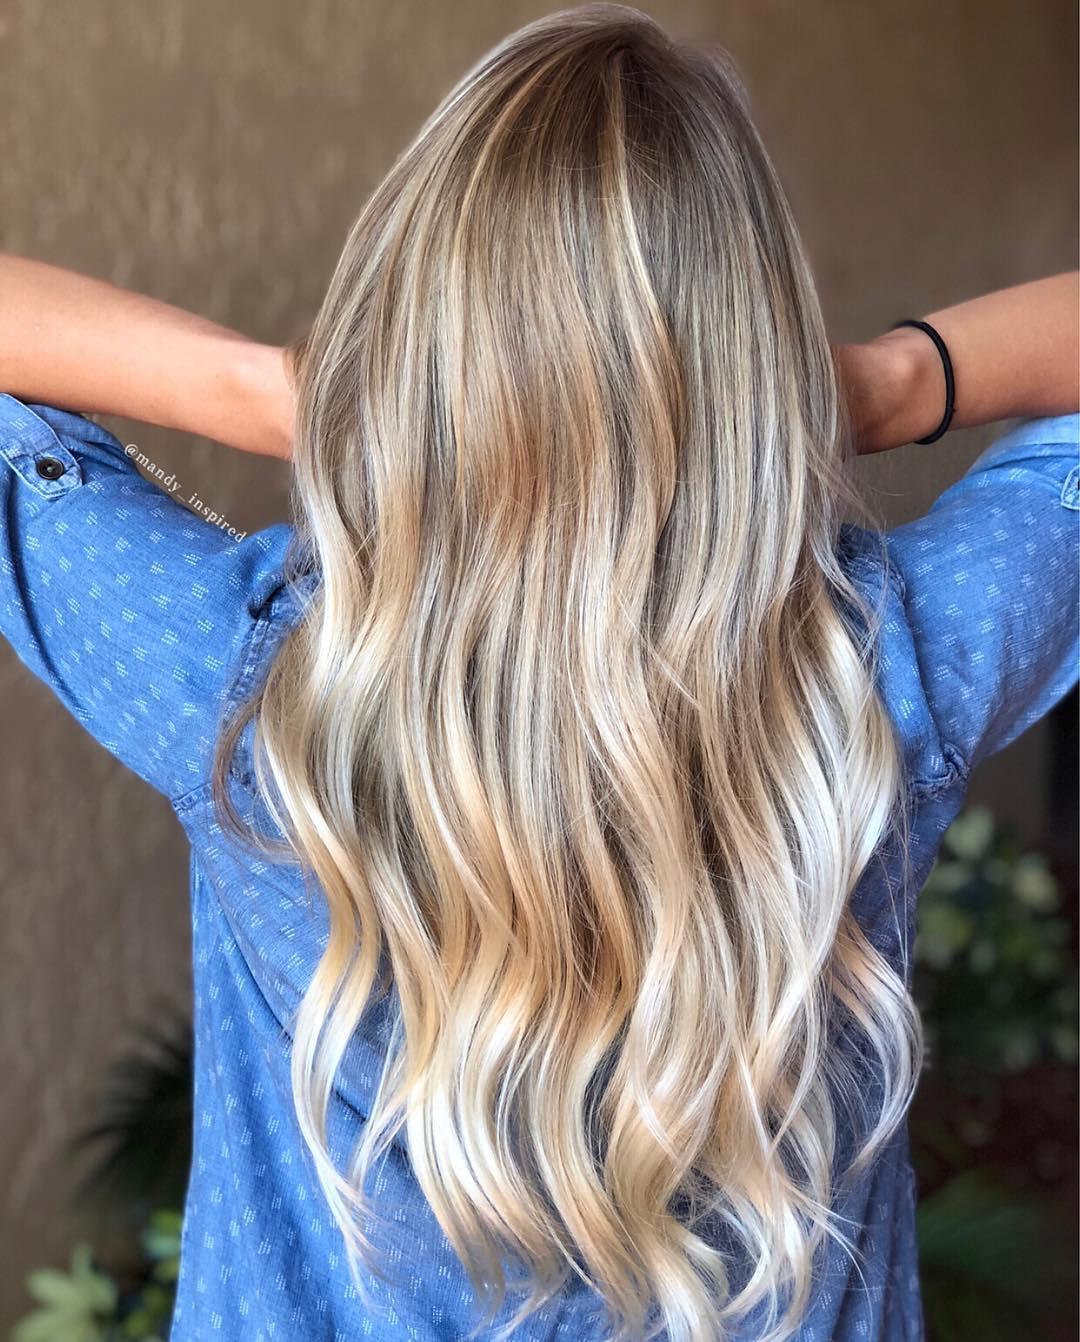 Hair We Love December 24th - 30th 2018